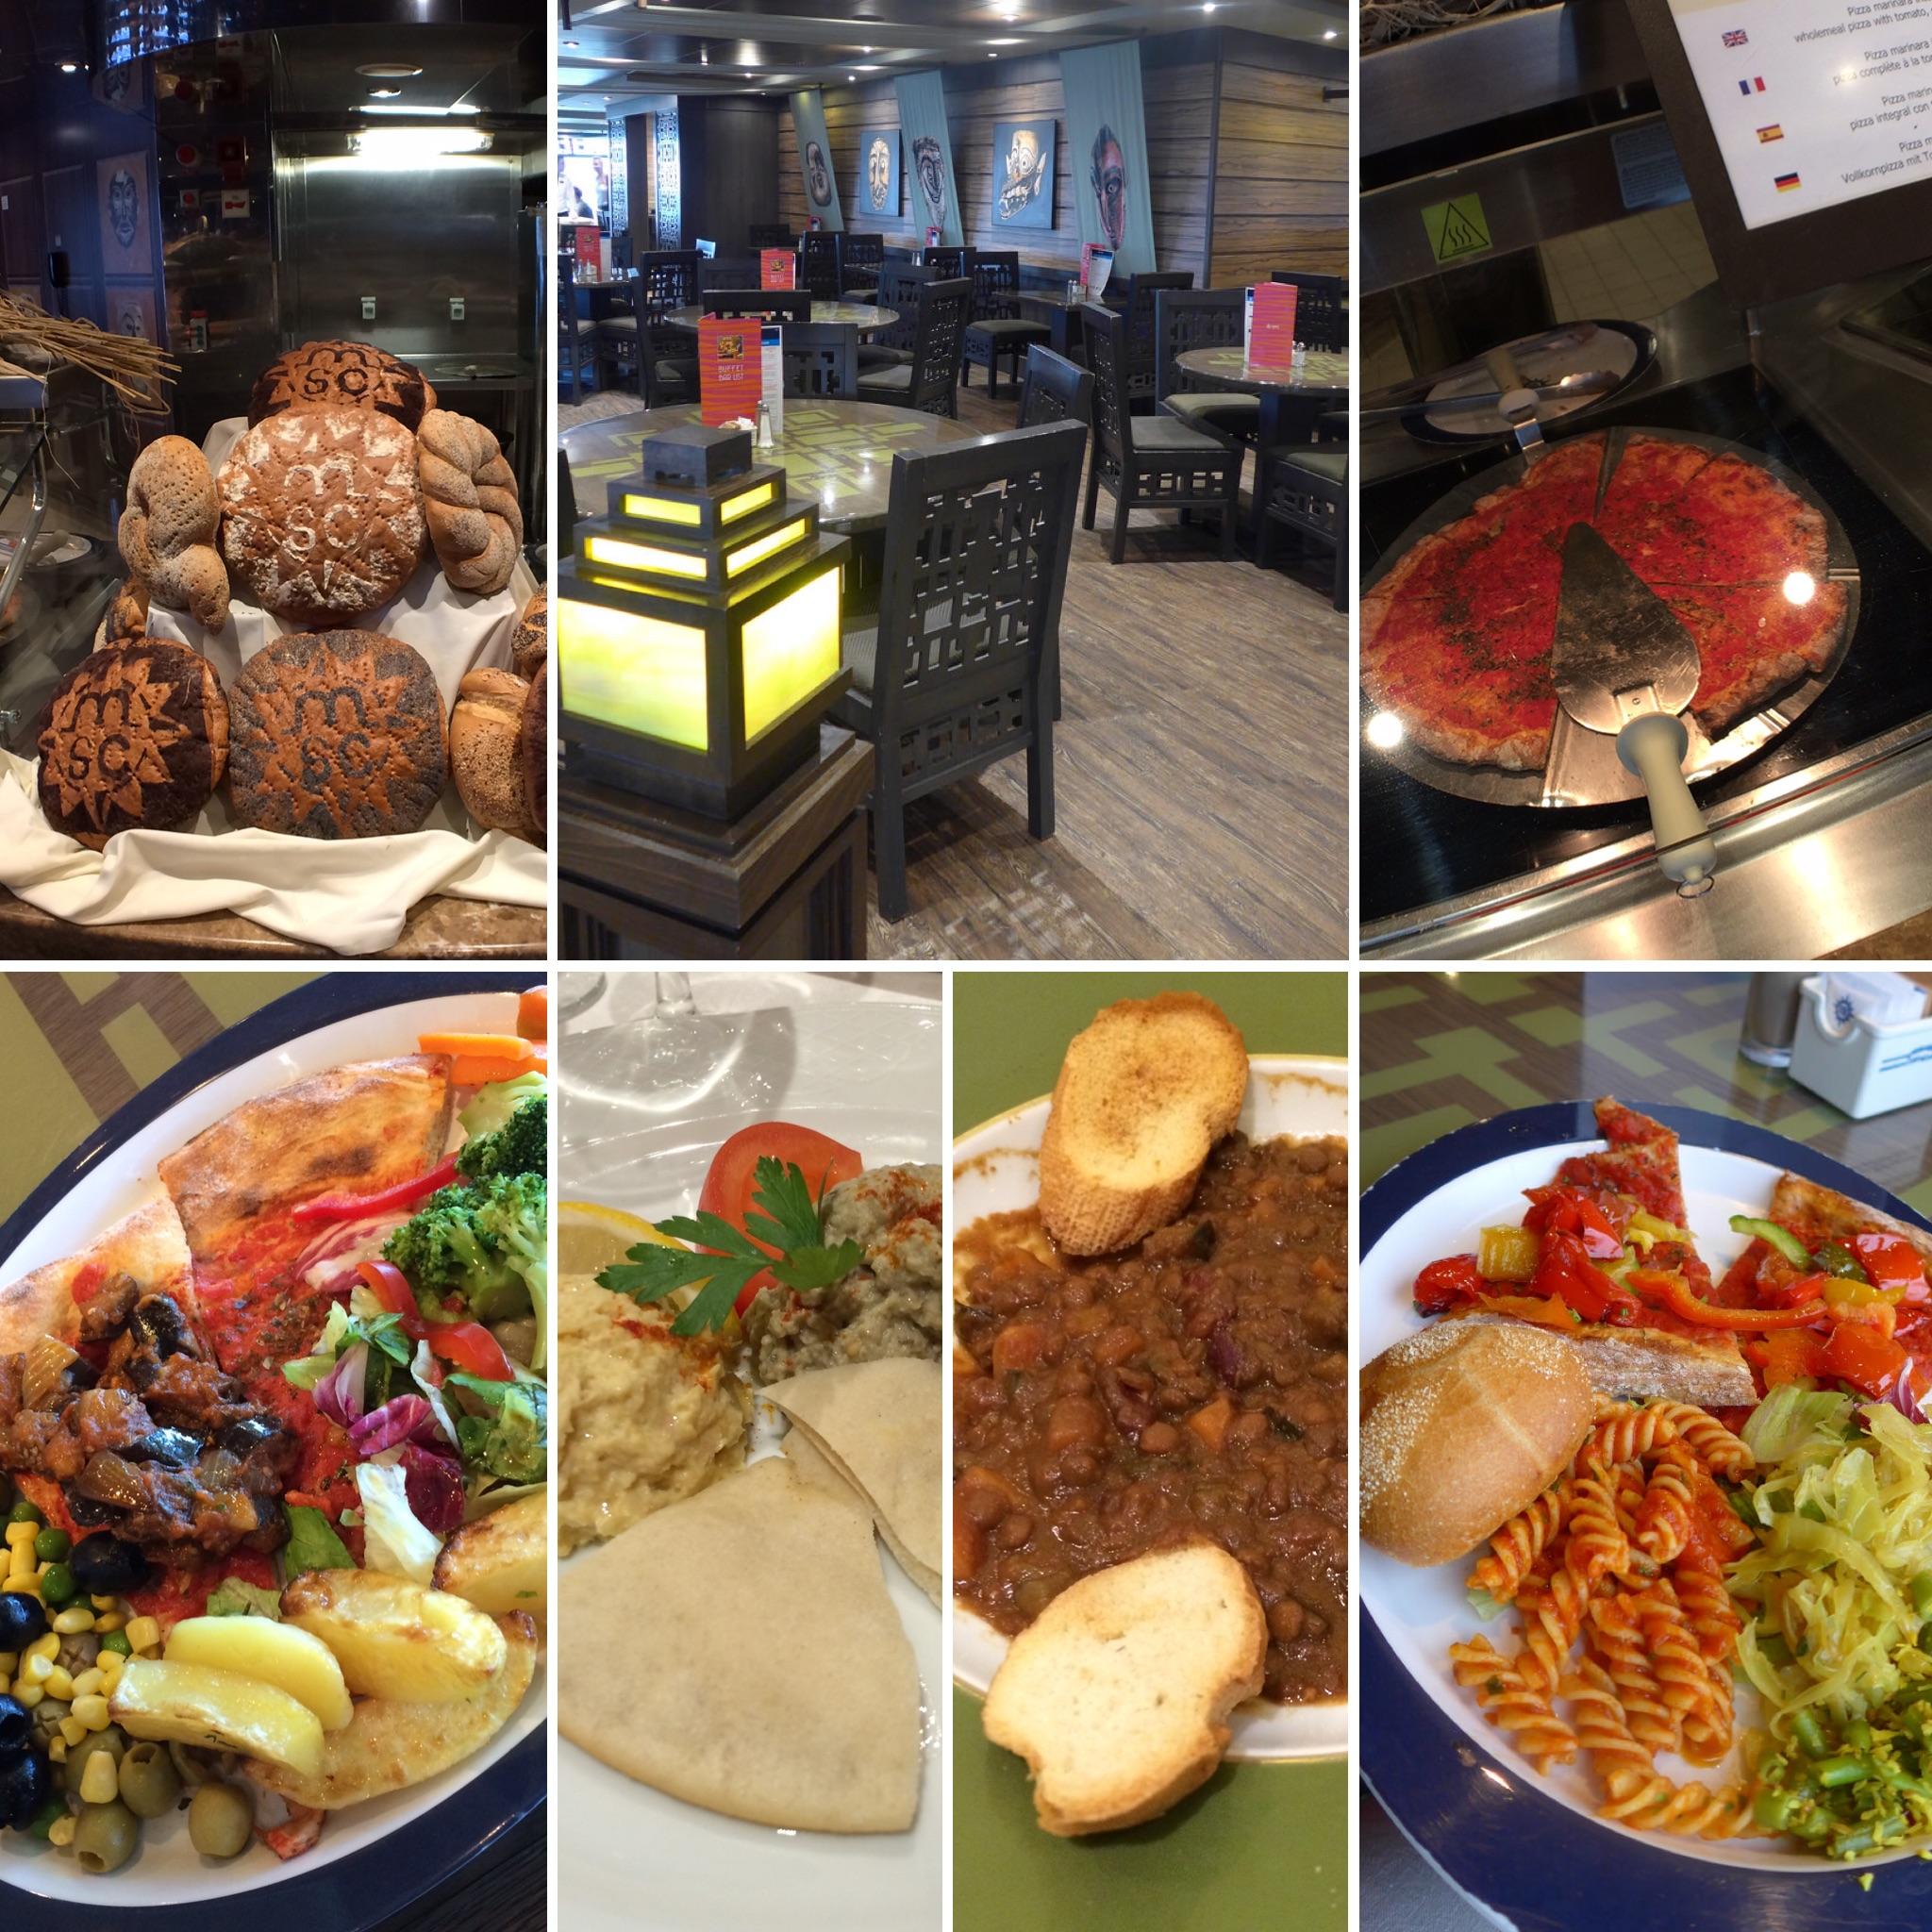 MSC Splendida vegan friendly cruise holiday food in buffet